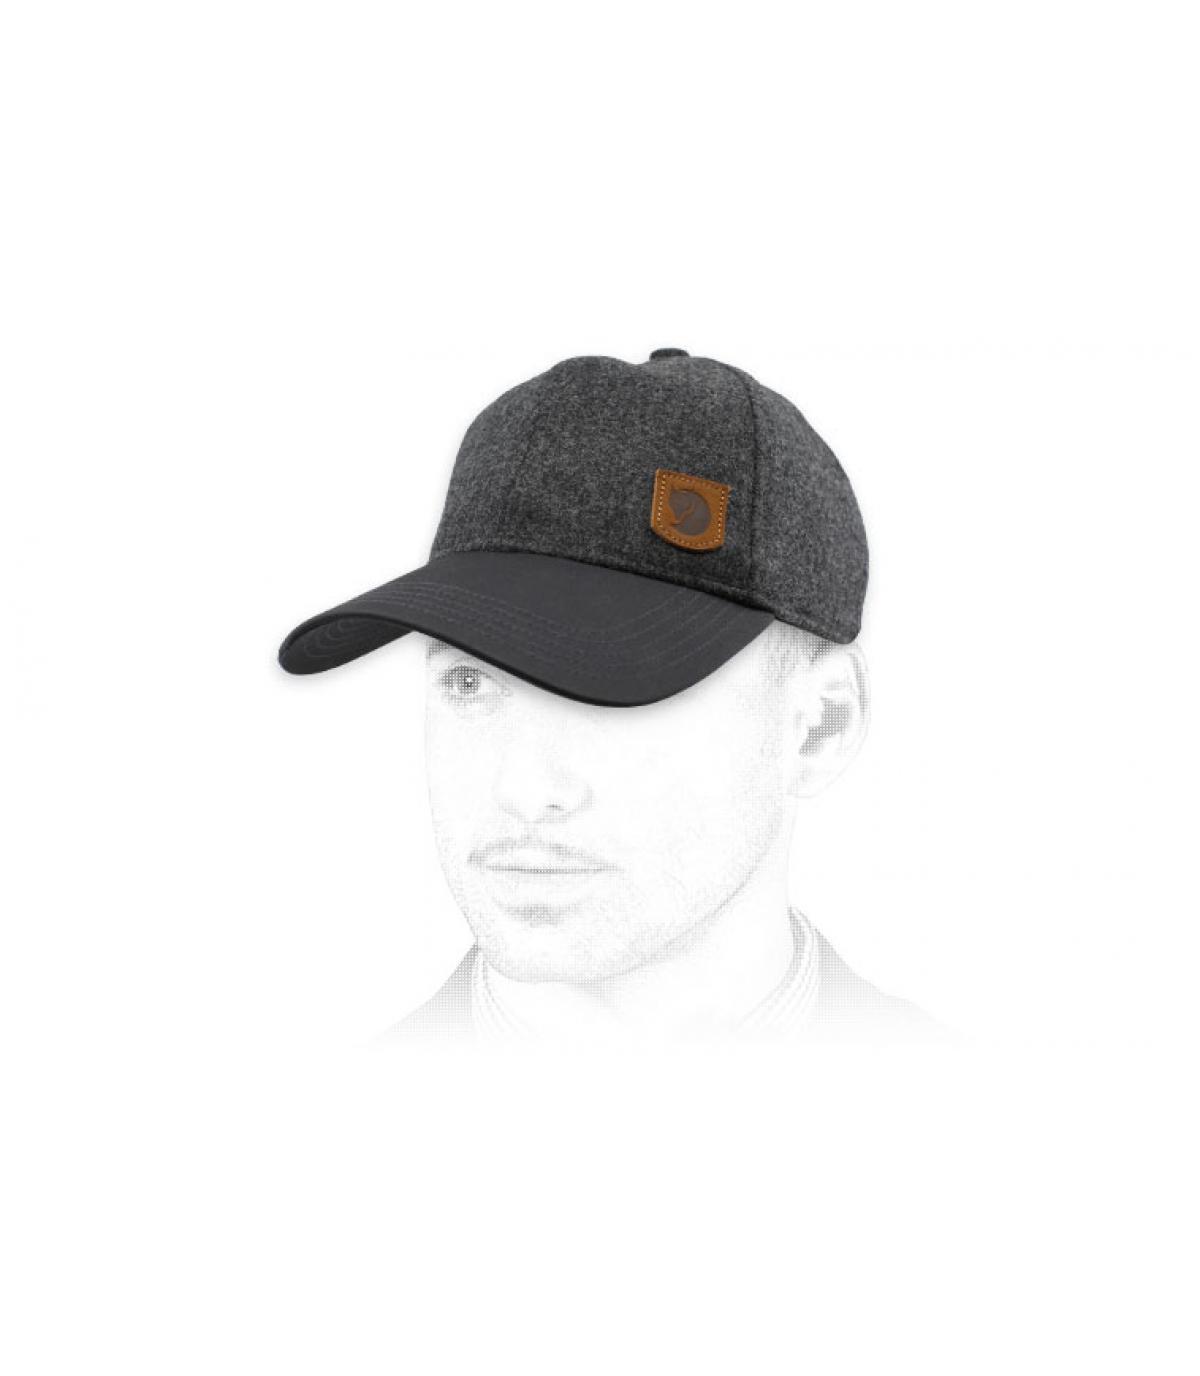 berretto di lana grigio Fjällräven